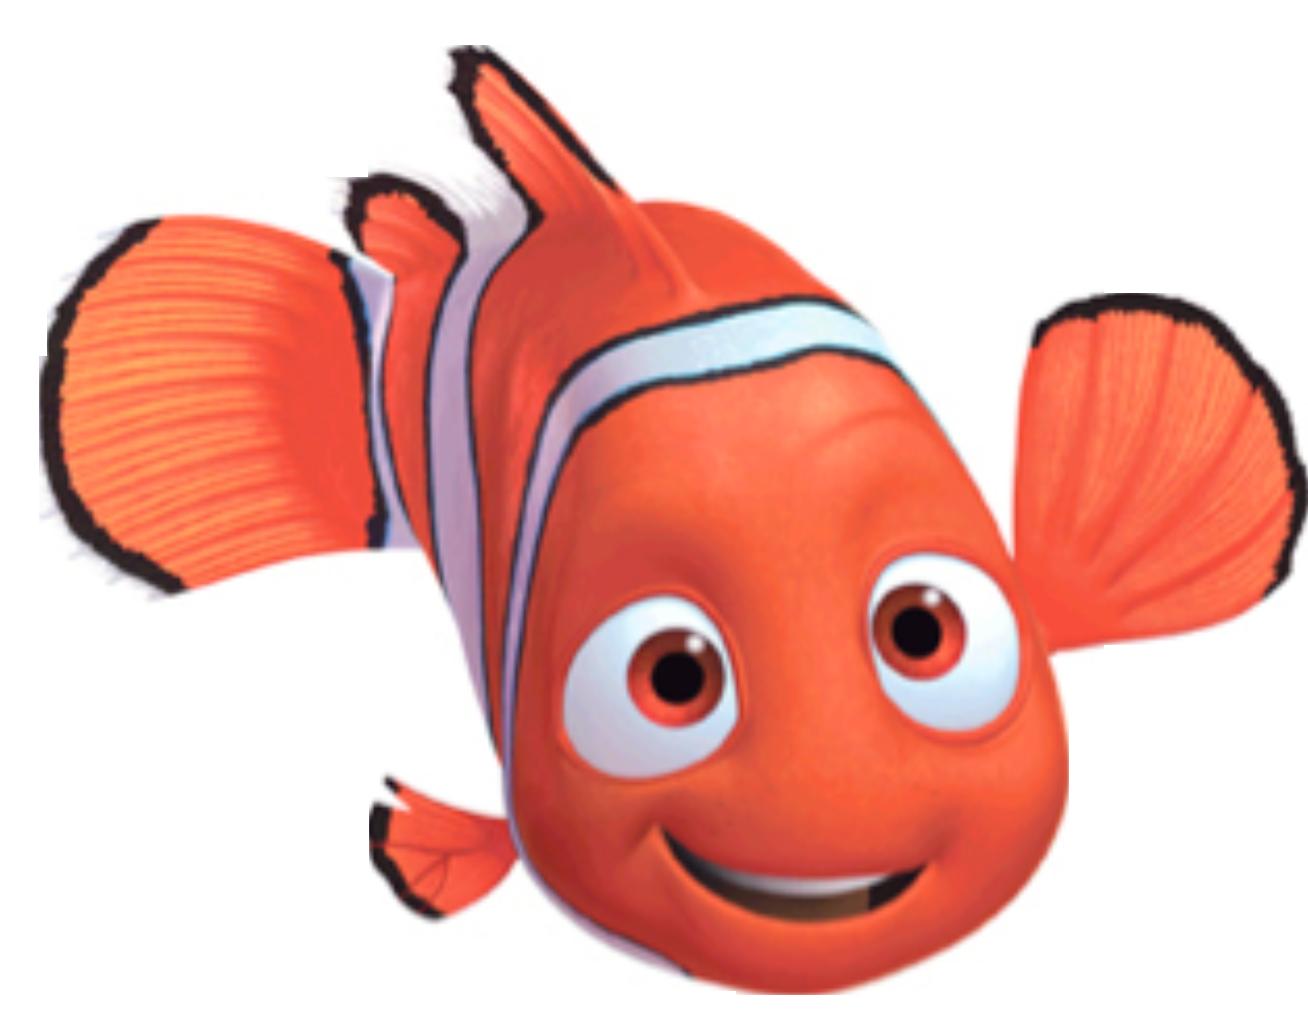 1308x1009 Finding Nemo Clip Art Amp Look At Finding Nemo Clip Art Clip Art